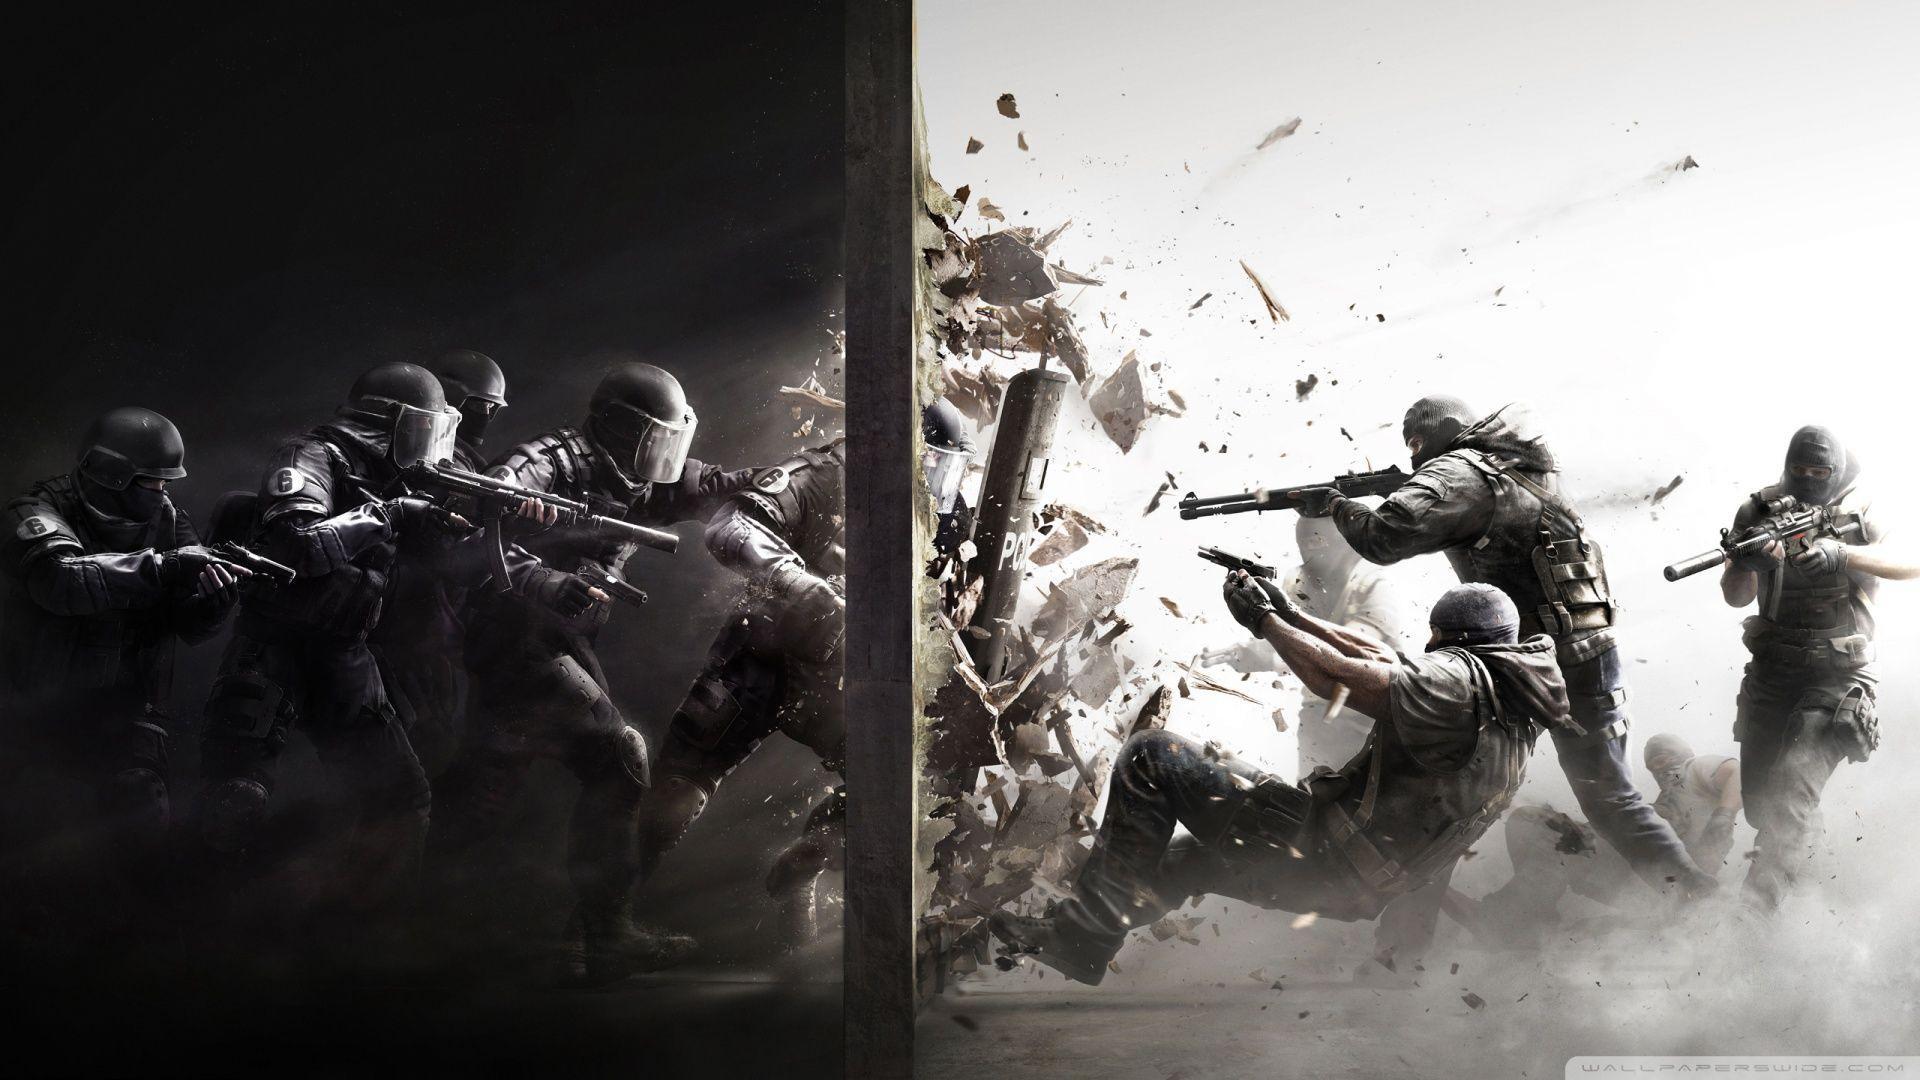 Tom Clancys Rainbow Six Siege Hd Wallpapers Wallpaper Cave